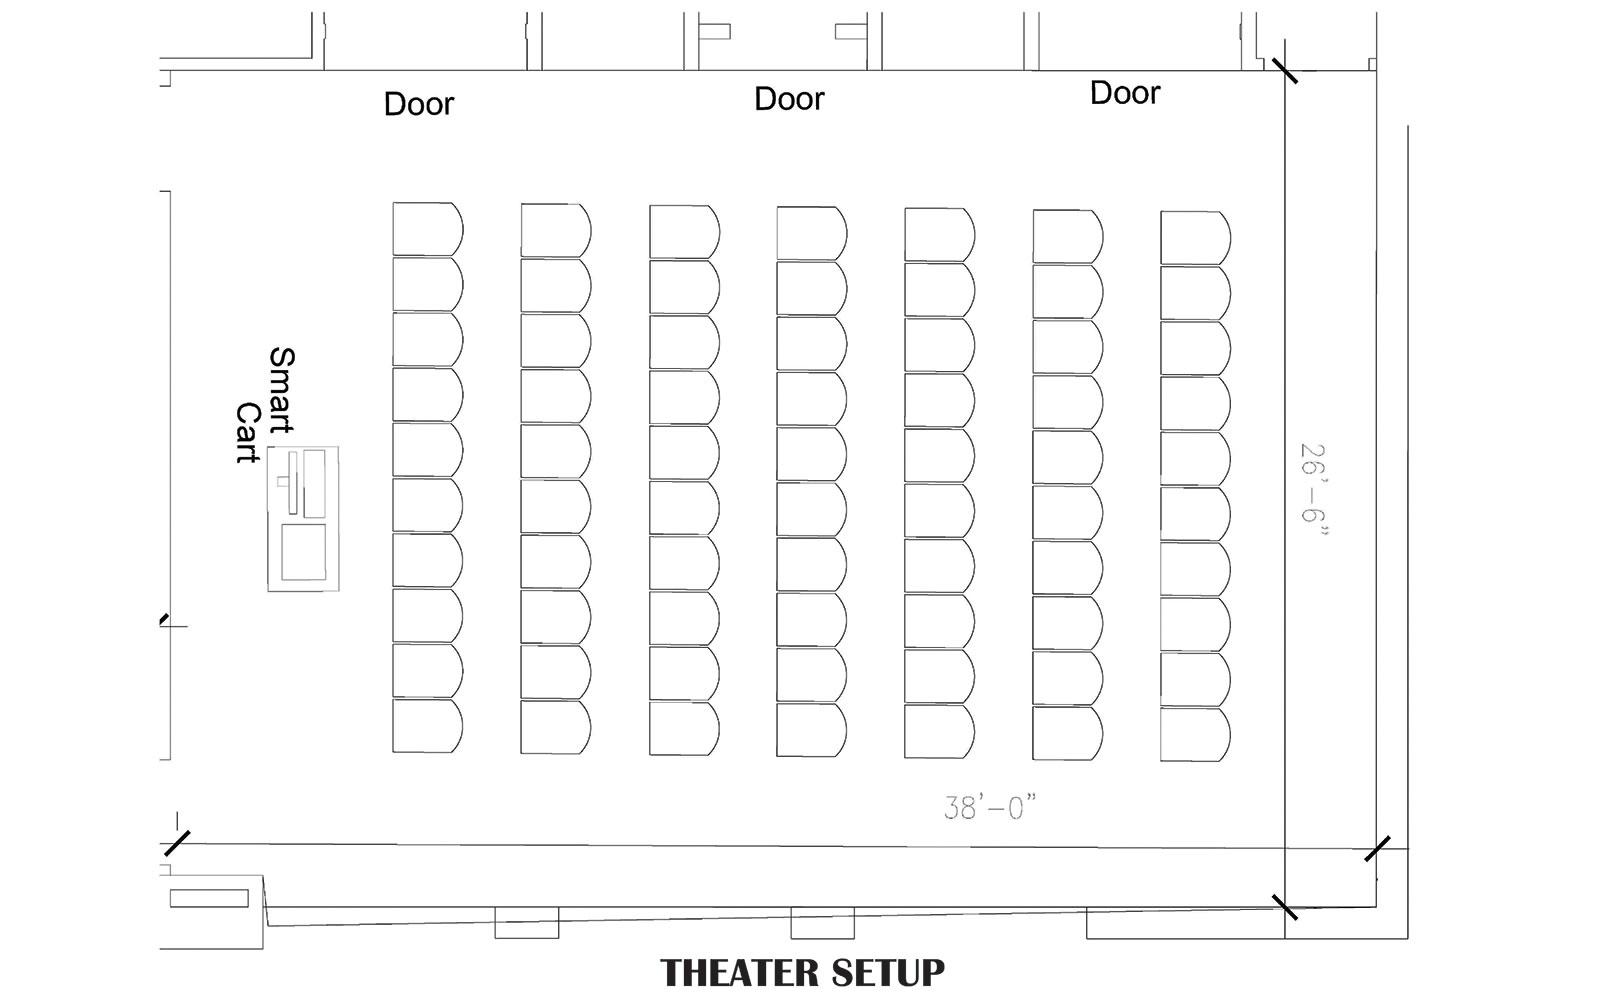 Theater Setup